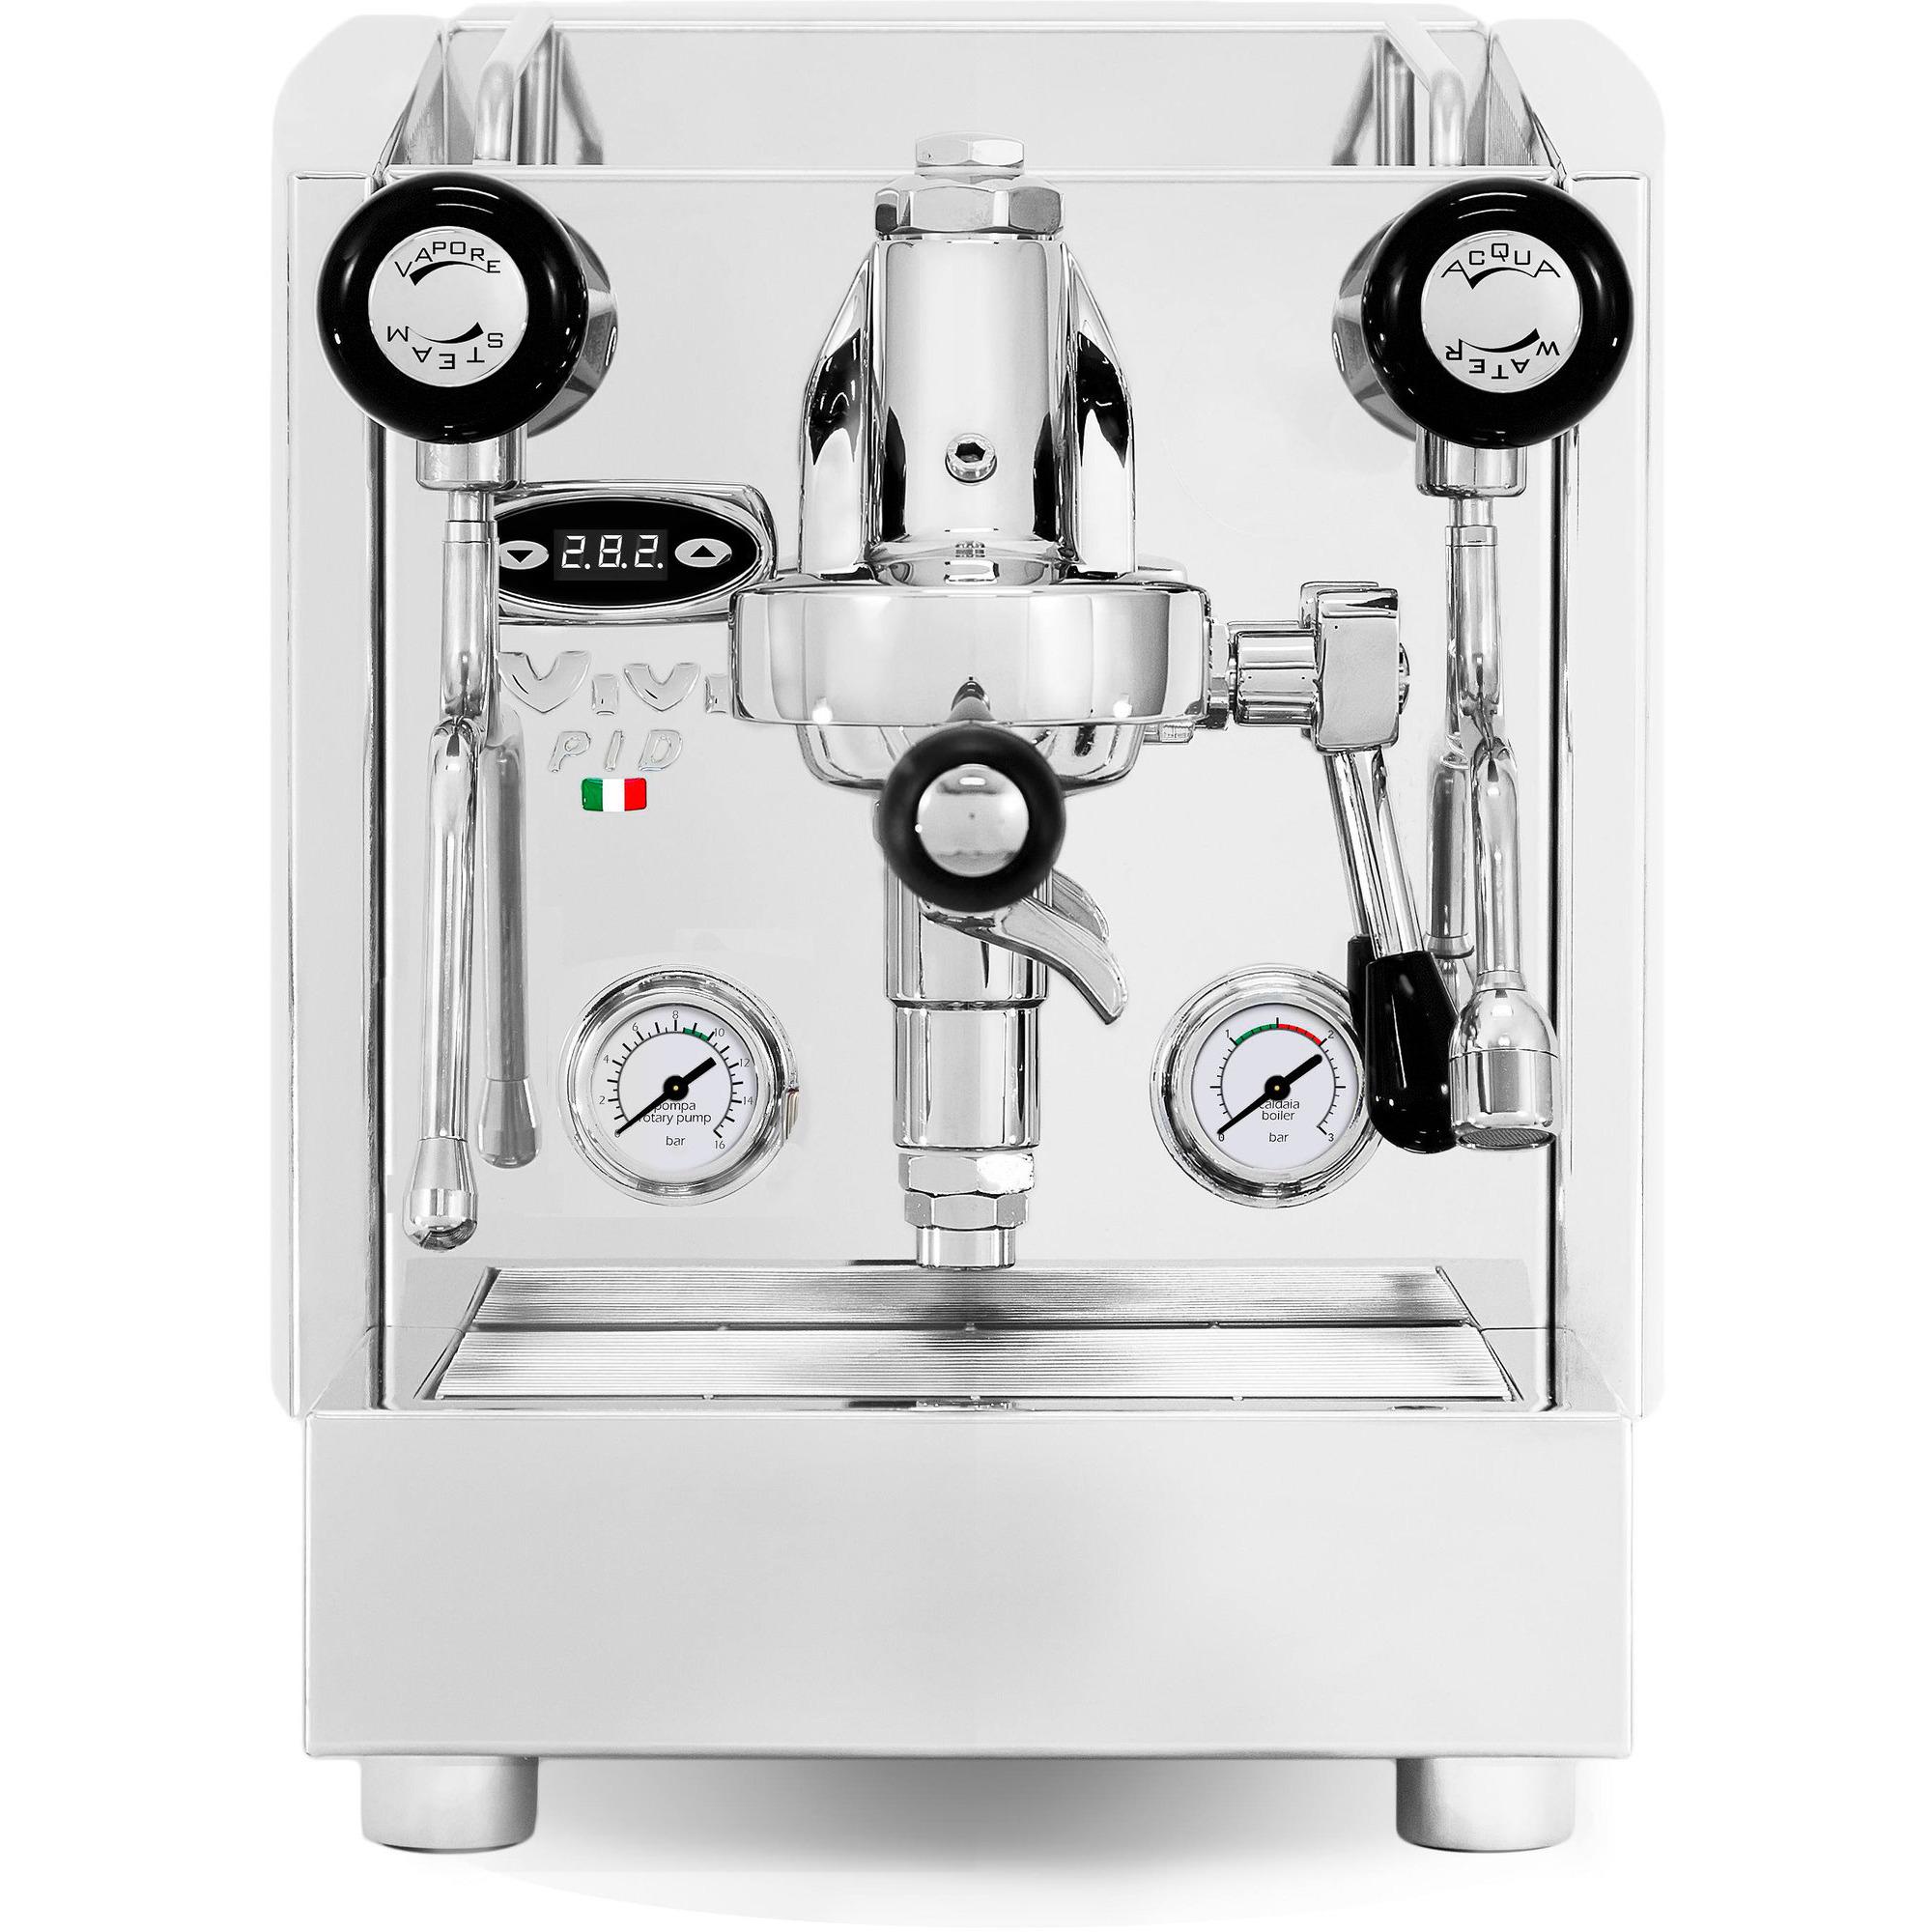 Izzo MyWay Vivi PID III – E61 Espressomaskin